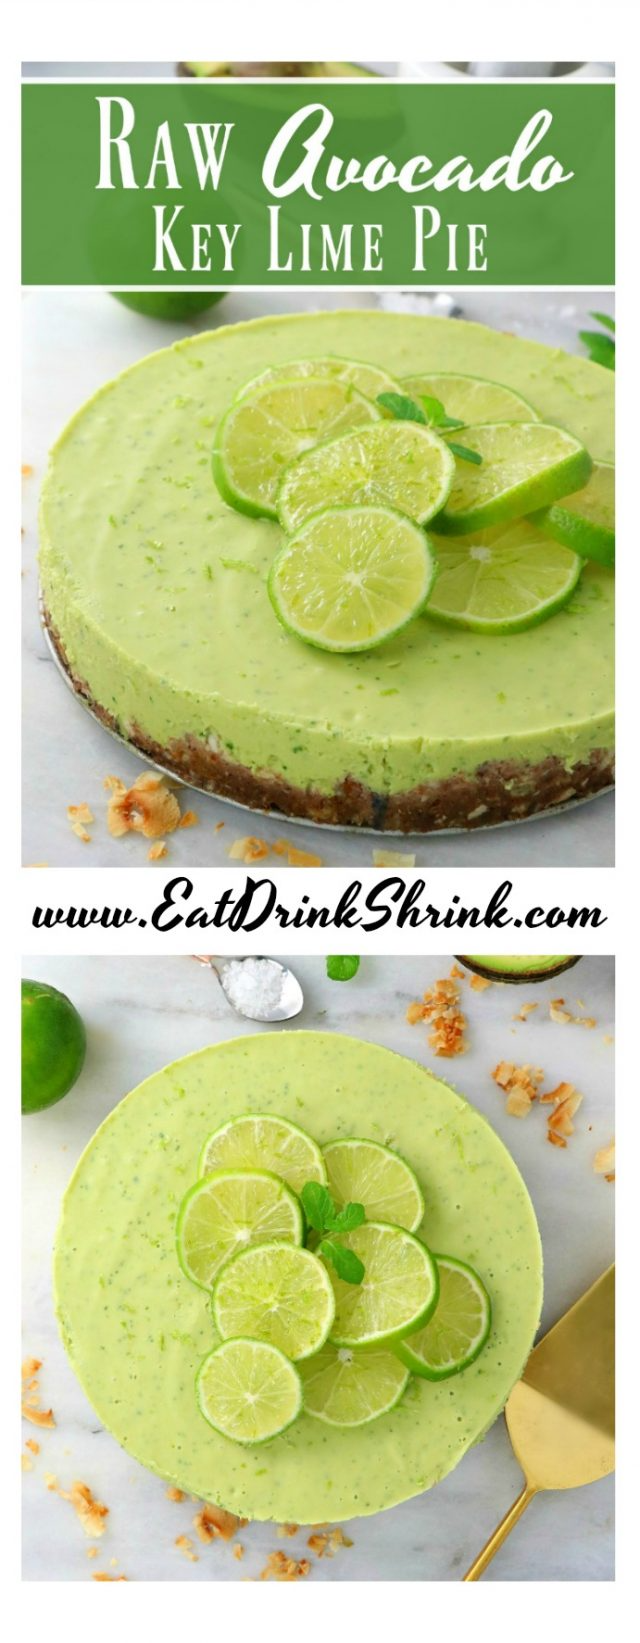 Raw Avocado Key Lime Pie Cheesecake Eat Drink Shrink Recipe In 2020 Vegan Key Lime Pie Vegan Key Lime Key Lime Pie Cheesecake